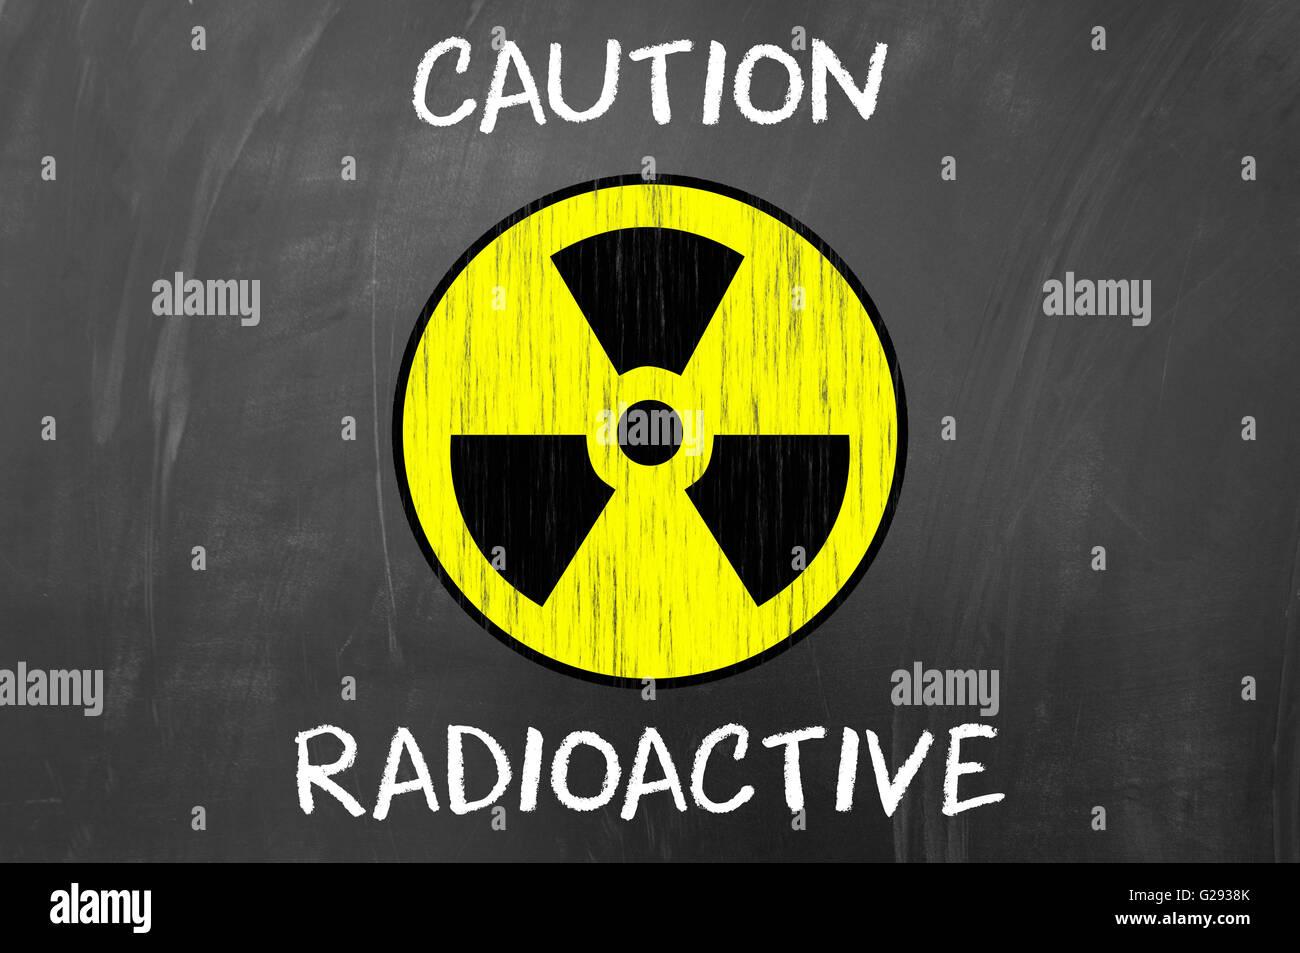 Caution radioactive symbol concept on blackboard stock photo caution radioactive symbol concept on blackboard buycottarizona